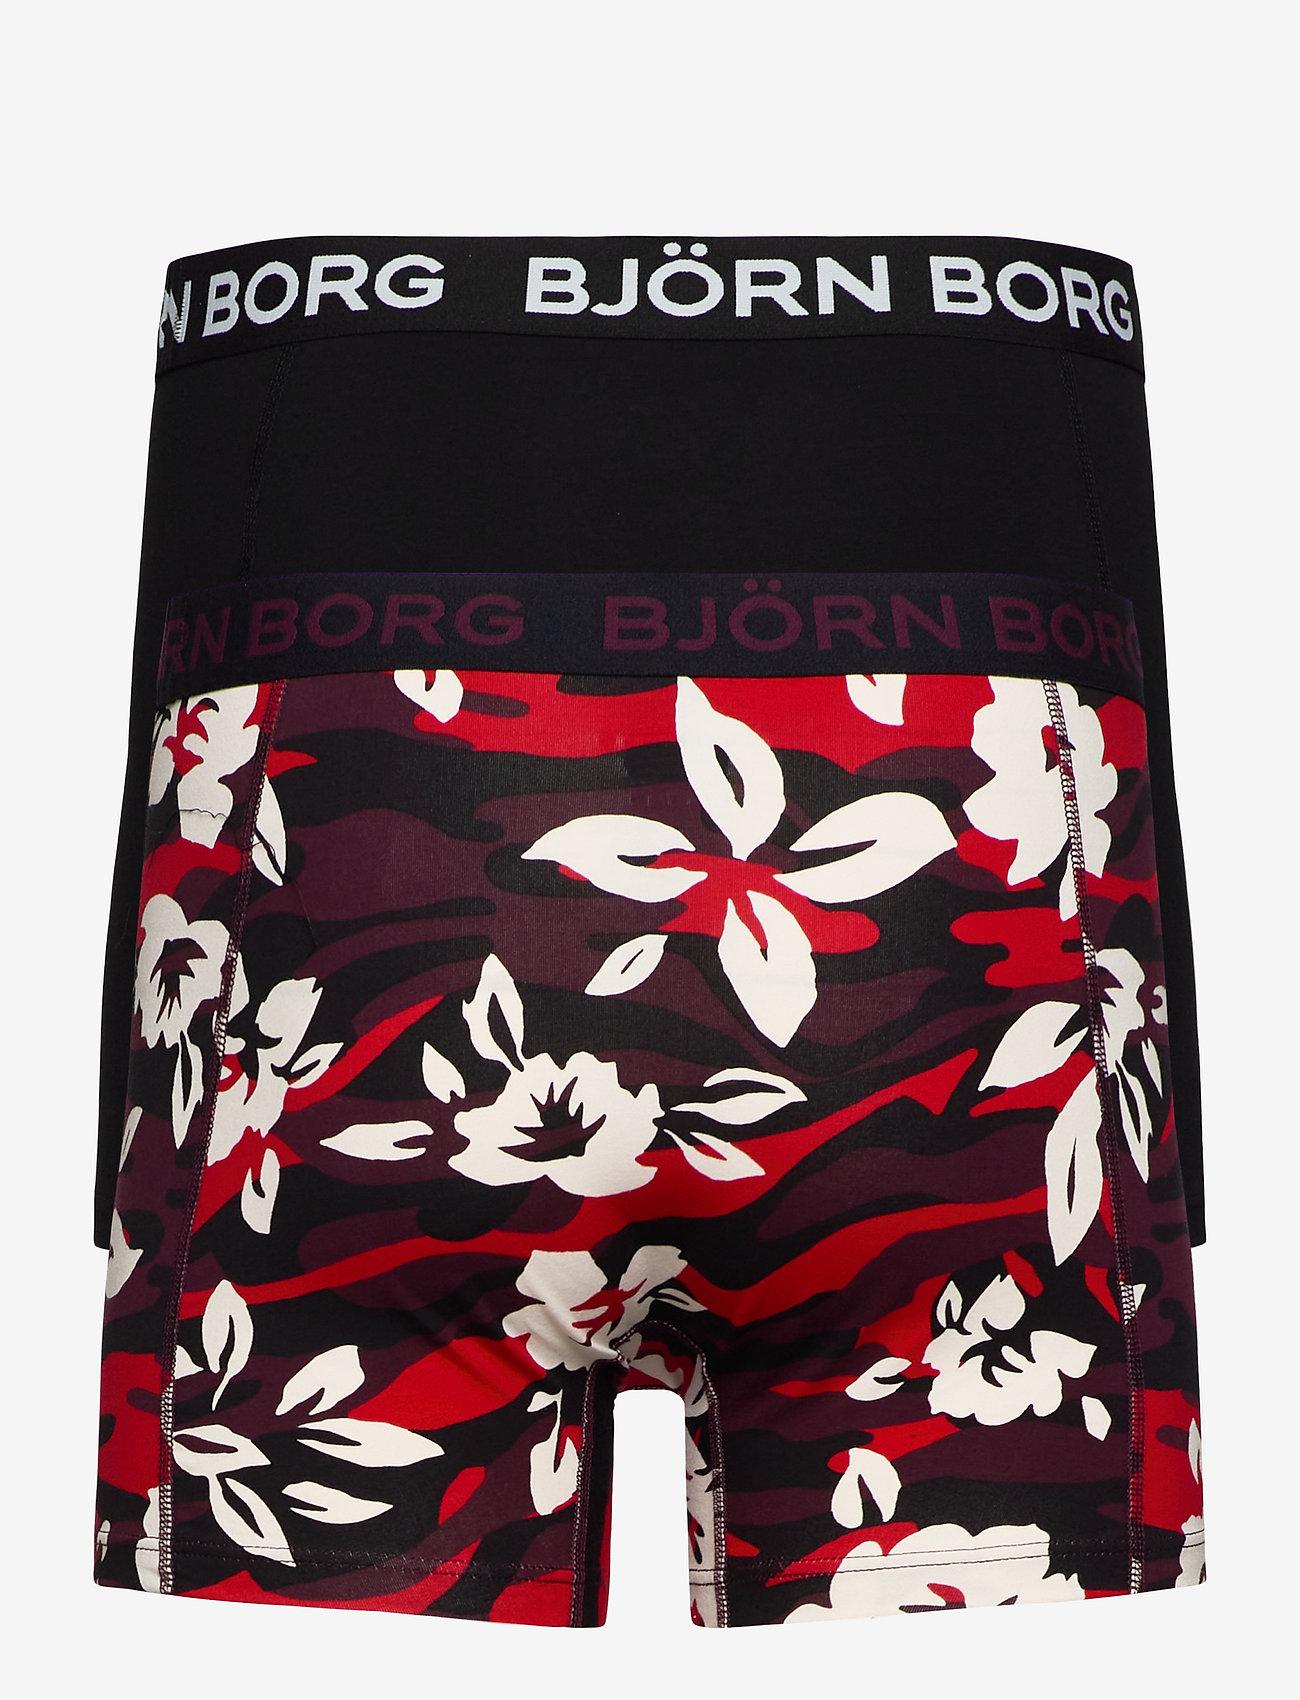 Björn Borg SHORTS SAMMY BB CAMO FLORAL - Boxershortser WINETASTING - Menn Klær